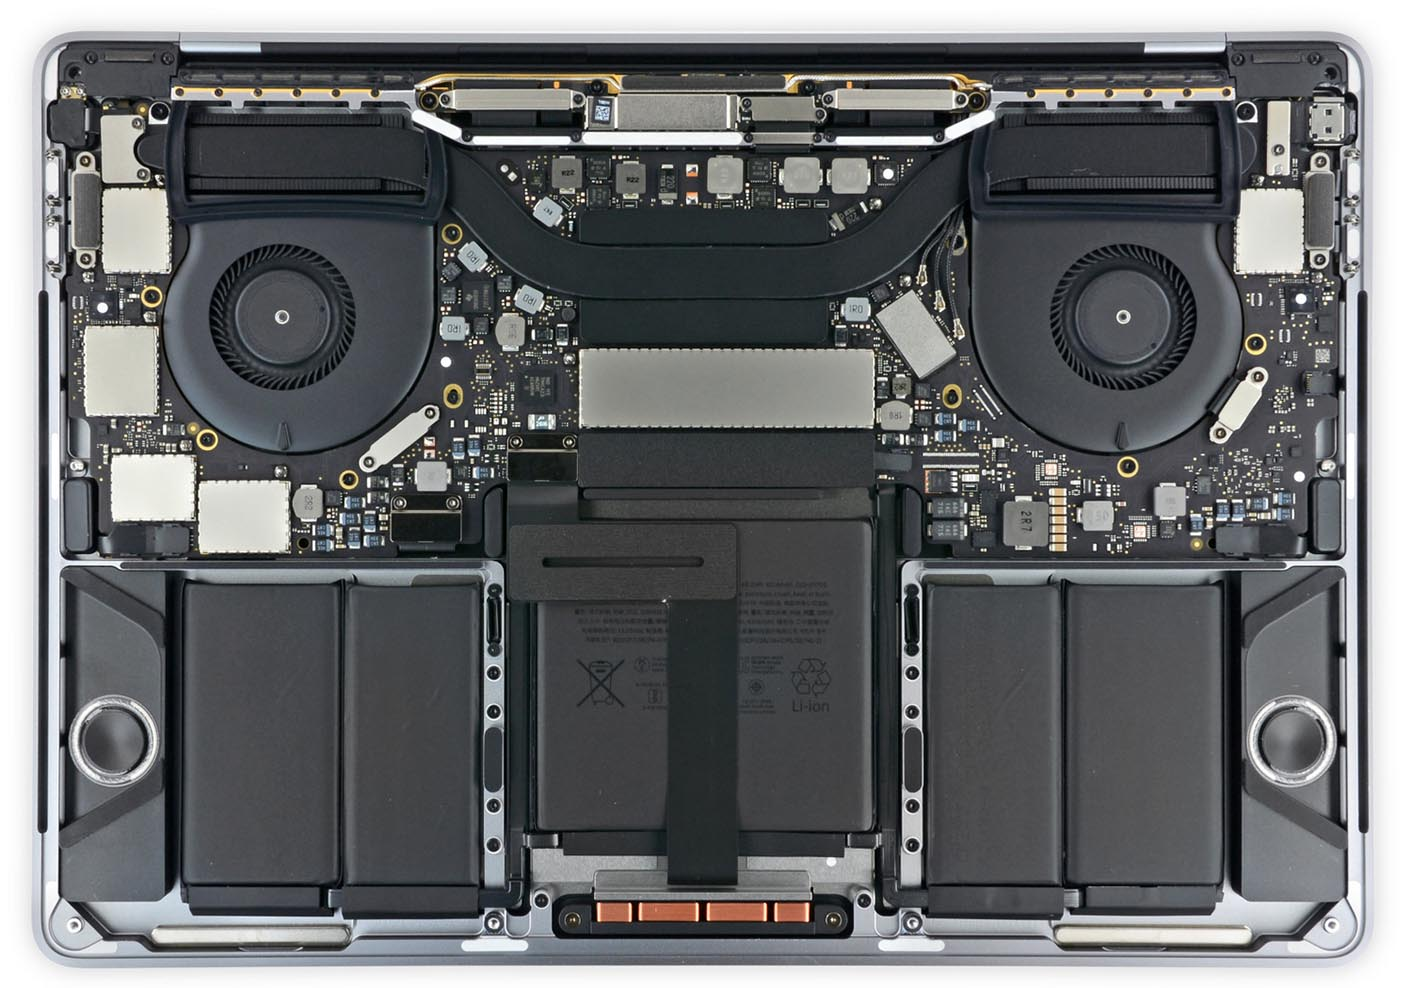 MacBook Pro 2017 iFixit